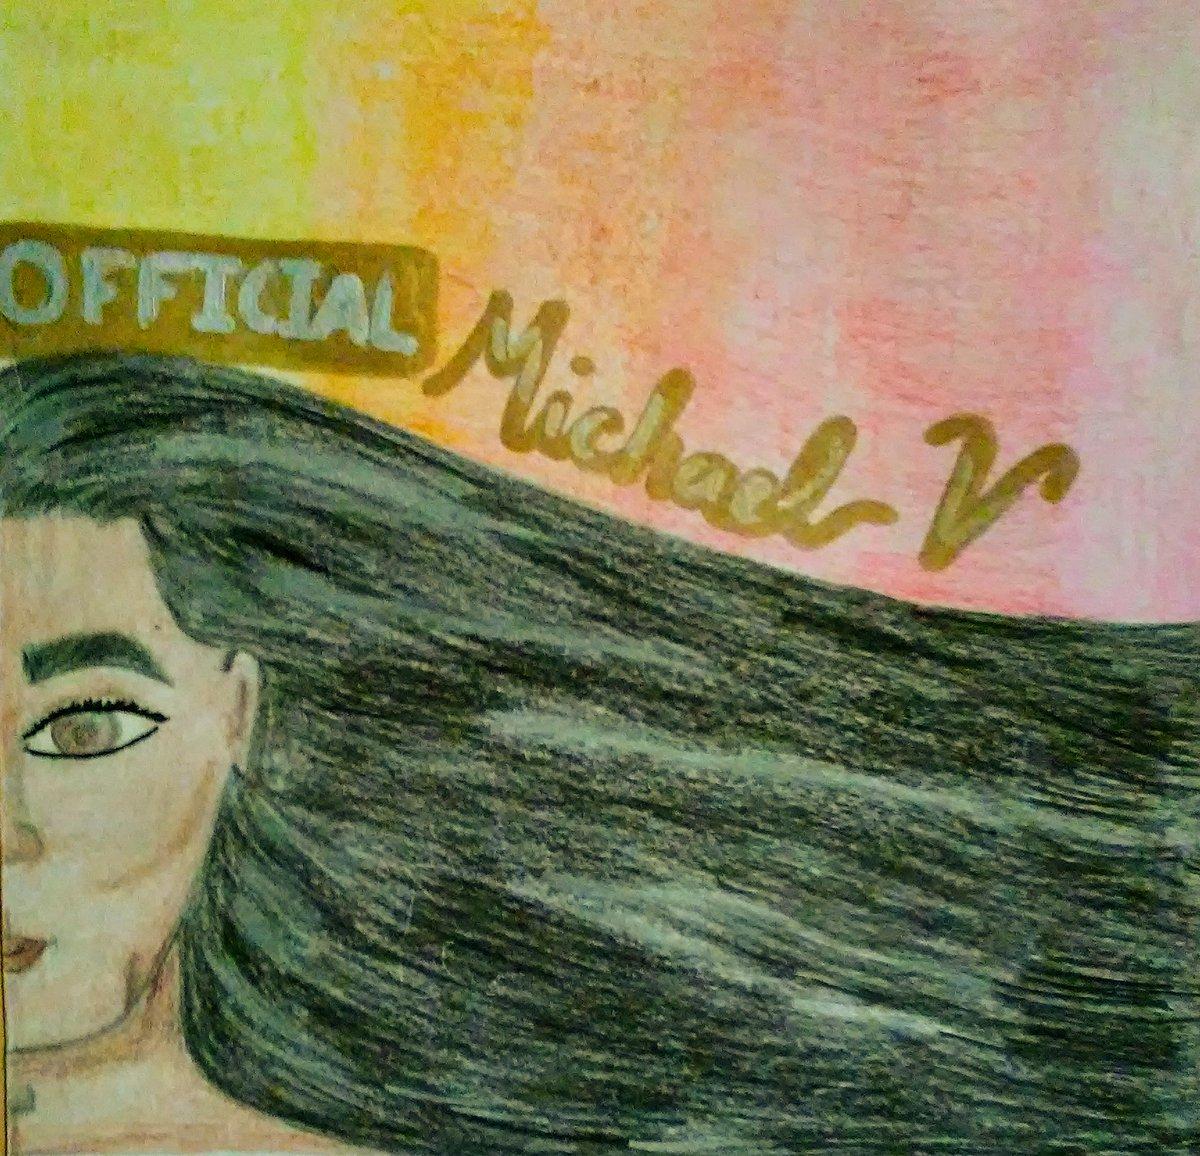 TB 😊 @MzNia_ @Floridabab95 @kmaria530 @SirAndrogynous  #drawing #sketchbook #Sketching #ArtistOnTwitter